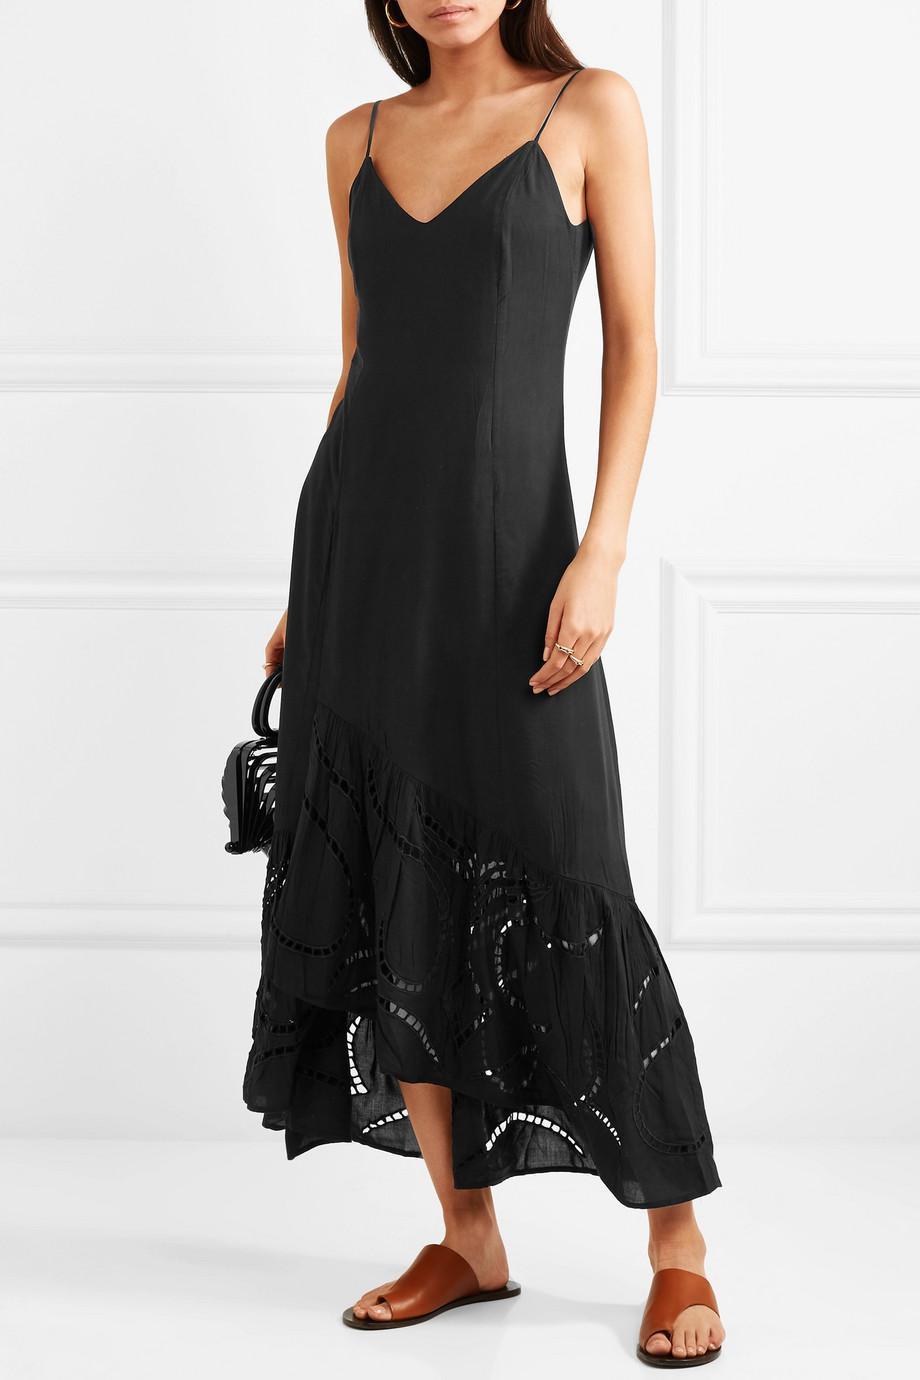 Elma Broderie Anglaise-paneled Voile Maxi Dress - Black Vix RzxksNUy5